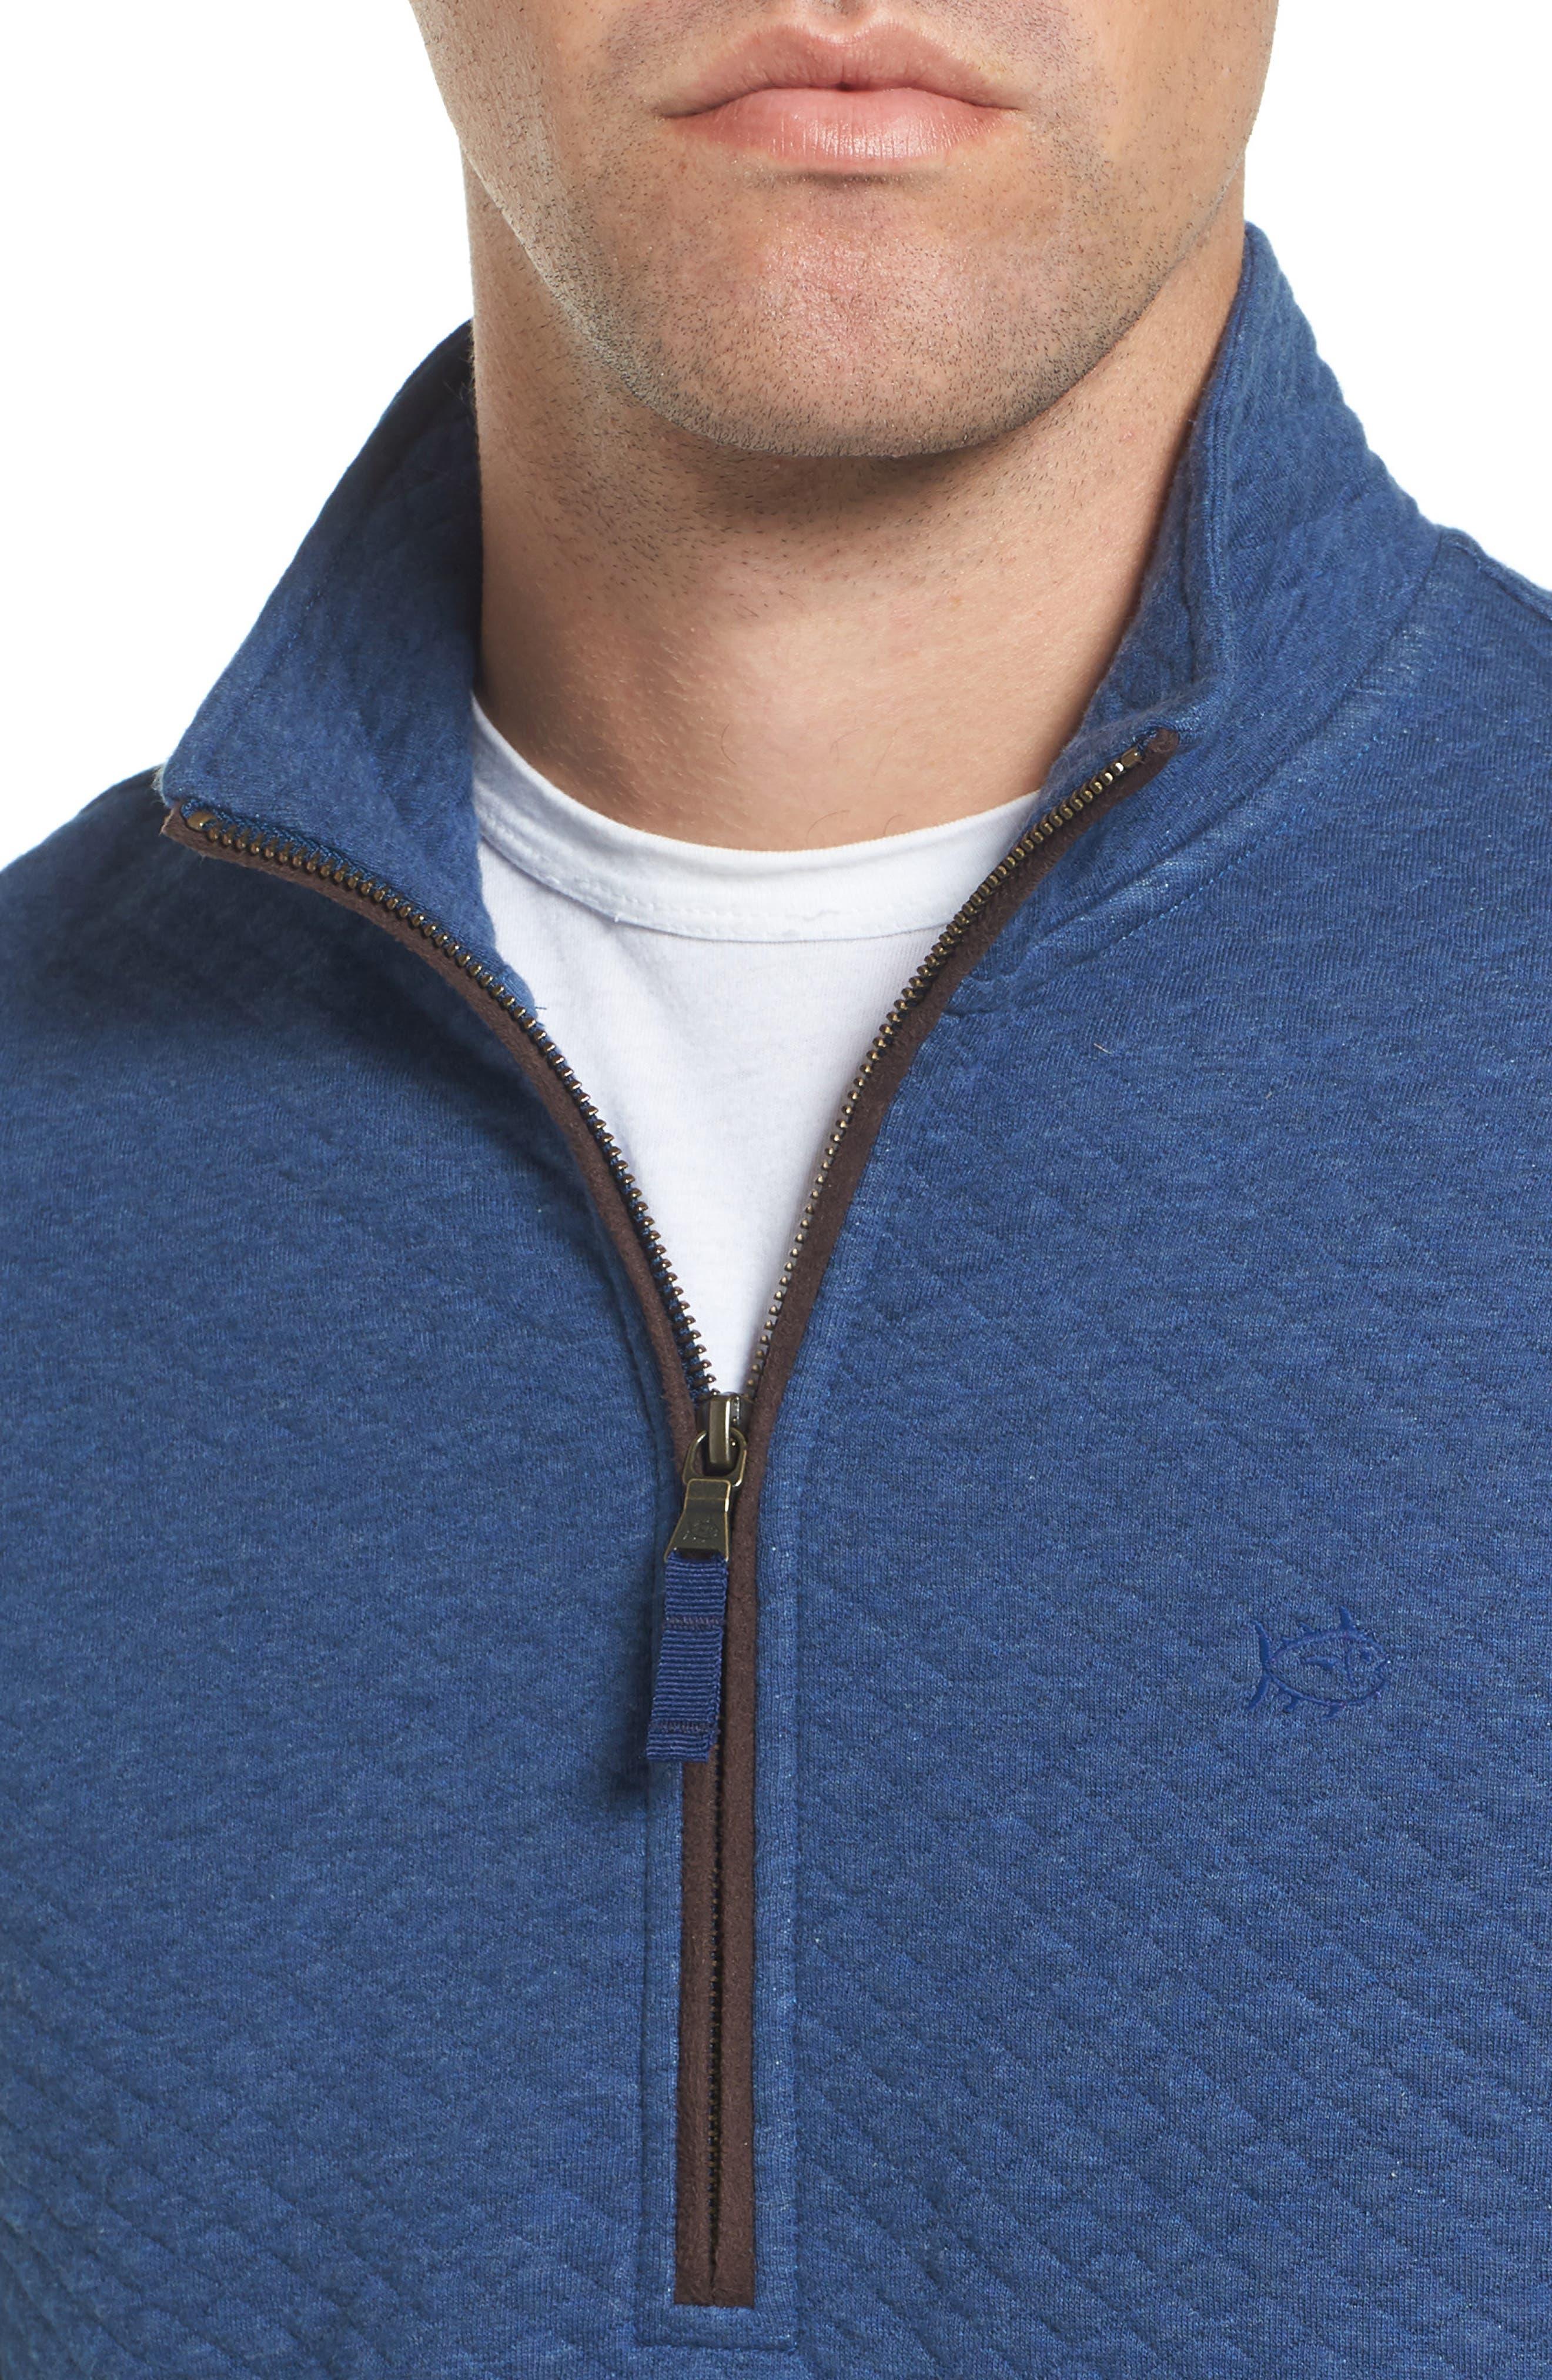 Sundown Quilted Quarter Zip Pullover,                             Alternate thumbnail 4, color,                             Skipper Blue